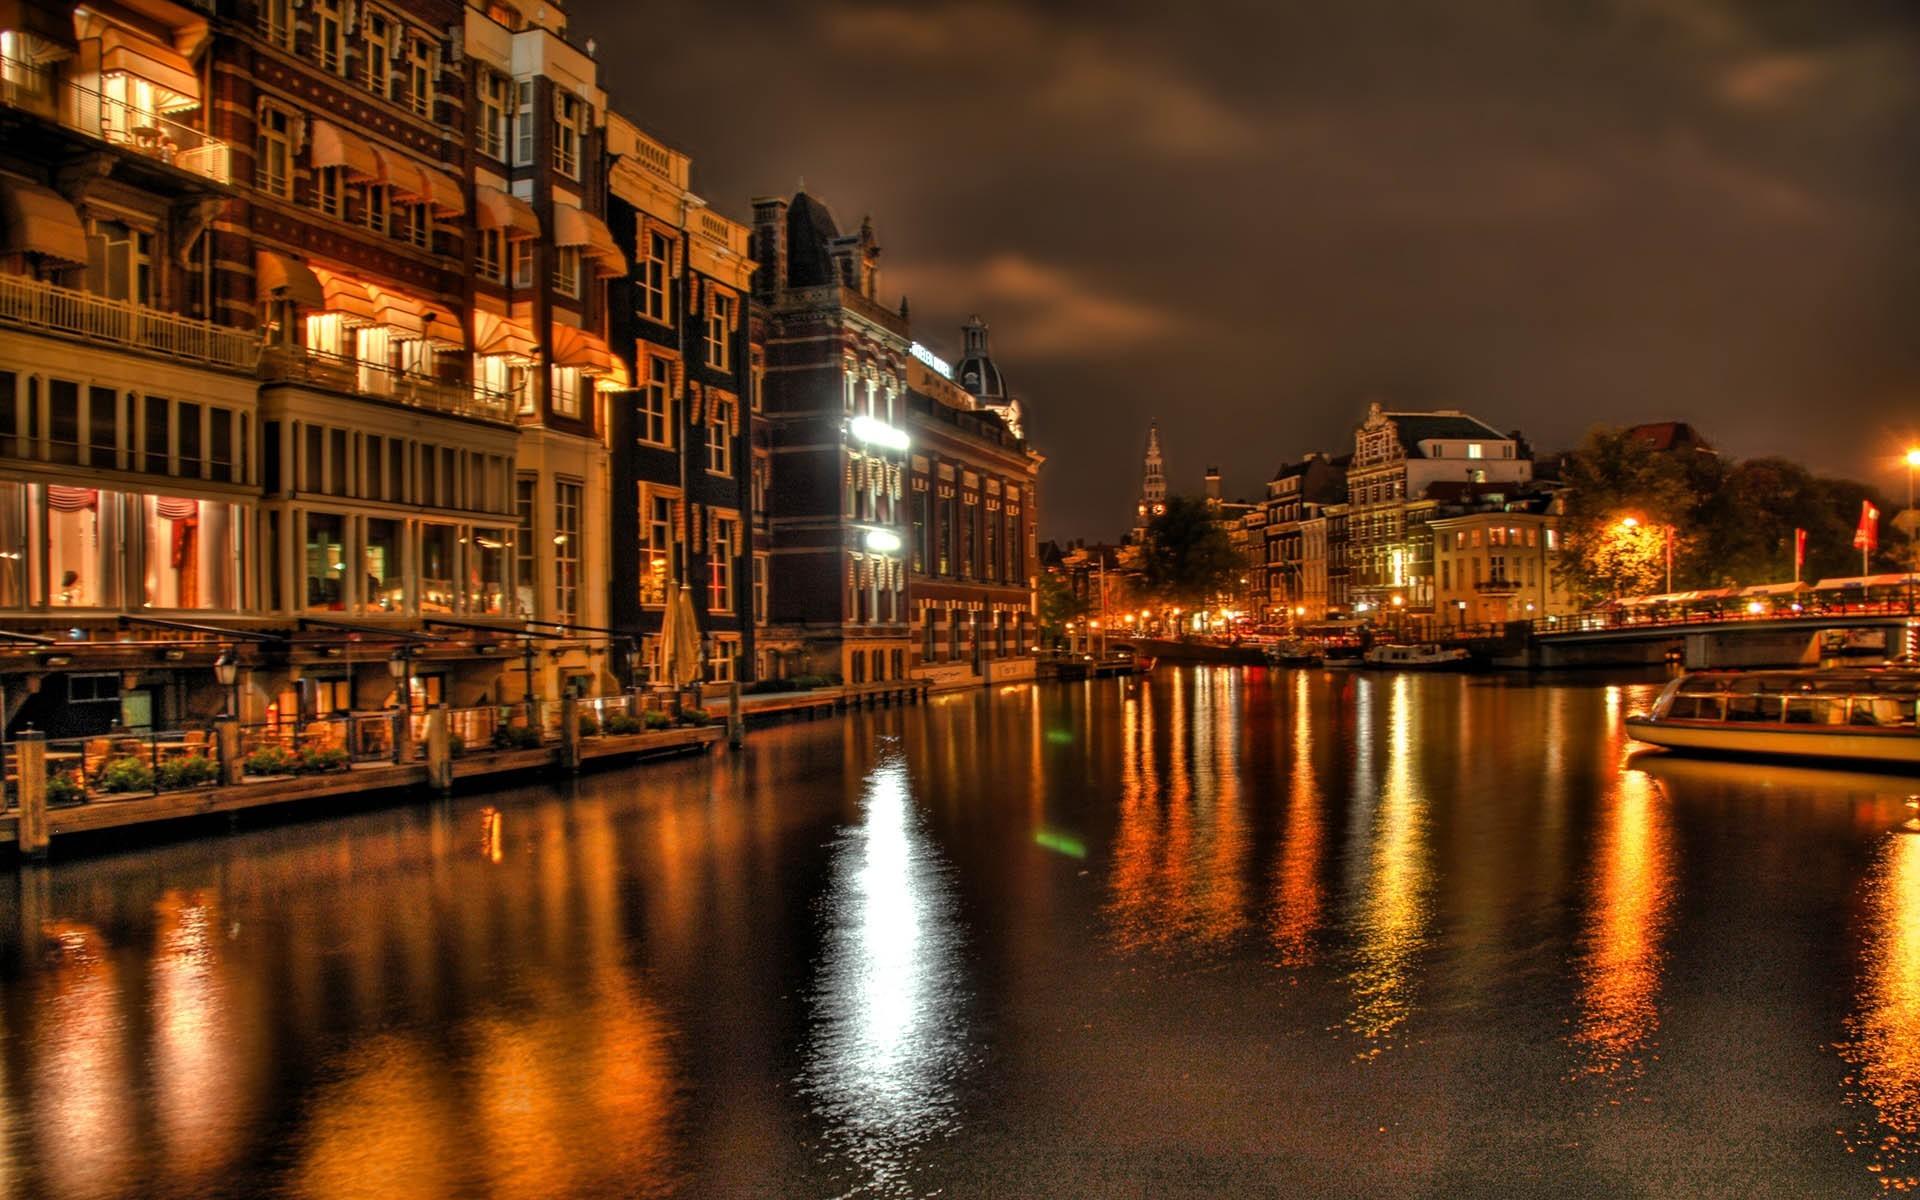 Nieuw Amsterdam cruise ship photos : Holland America Amsterdam black and white photos